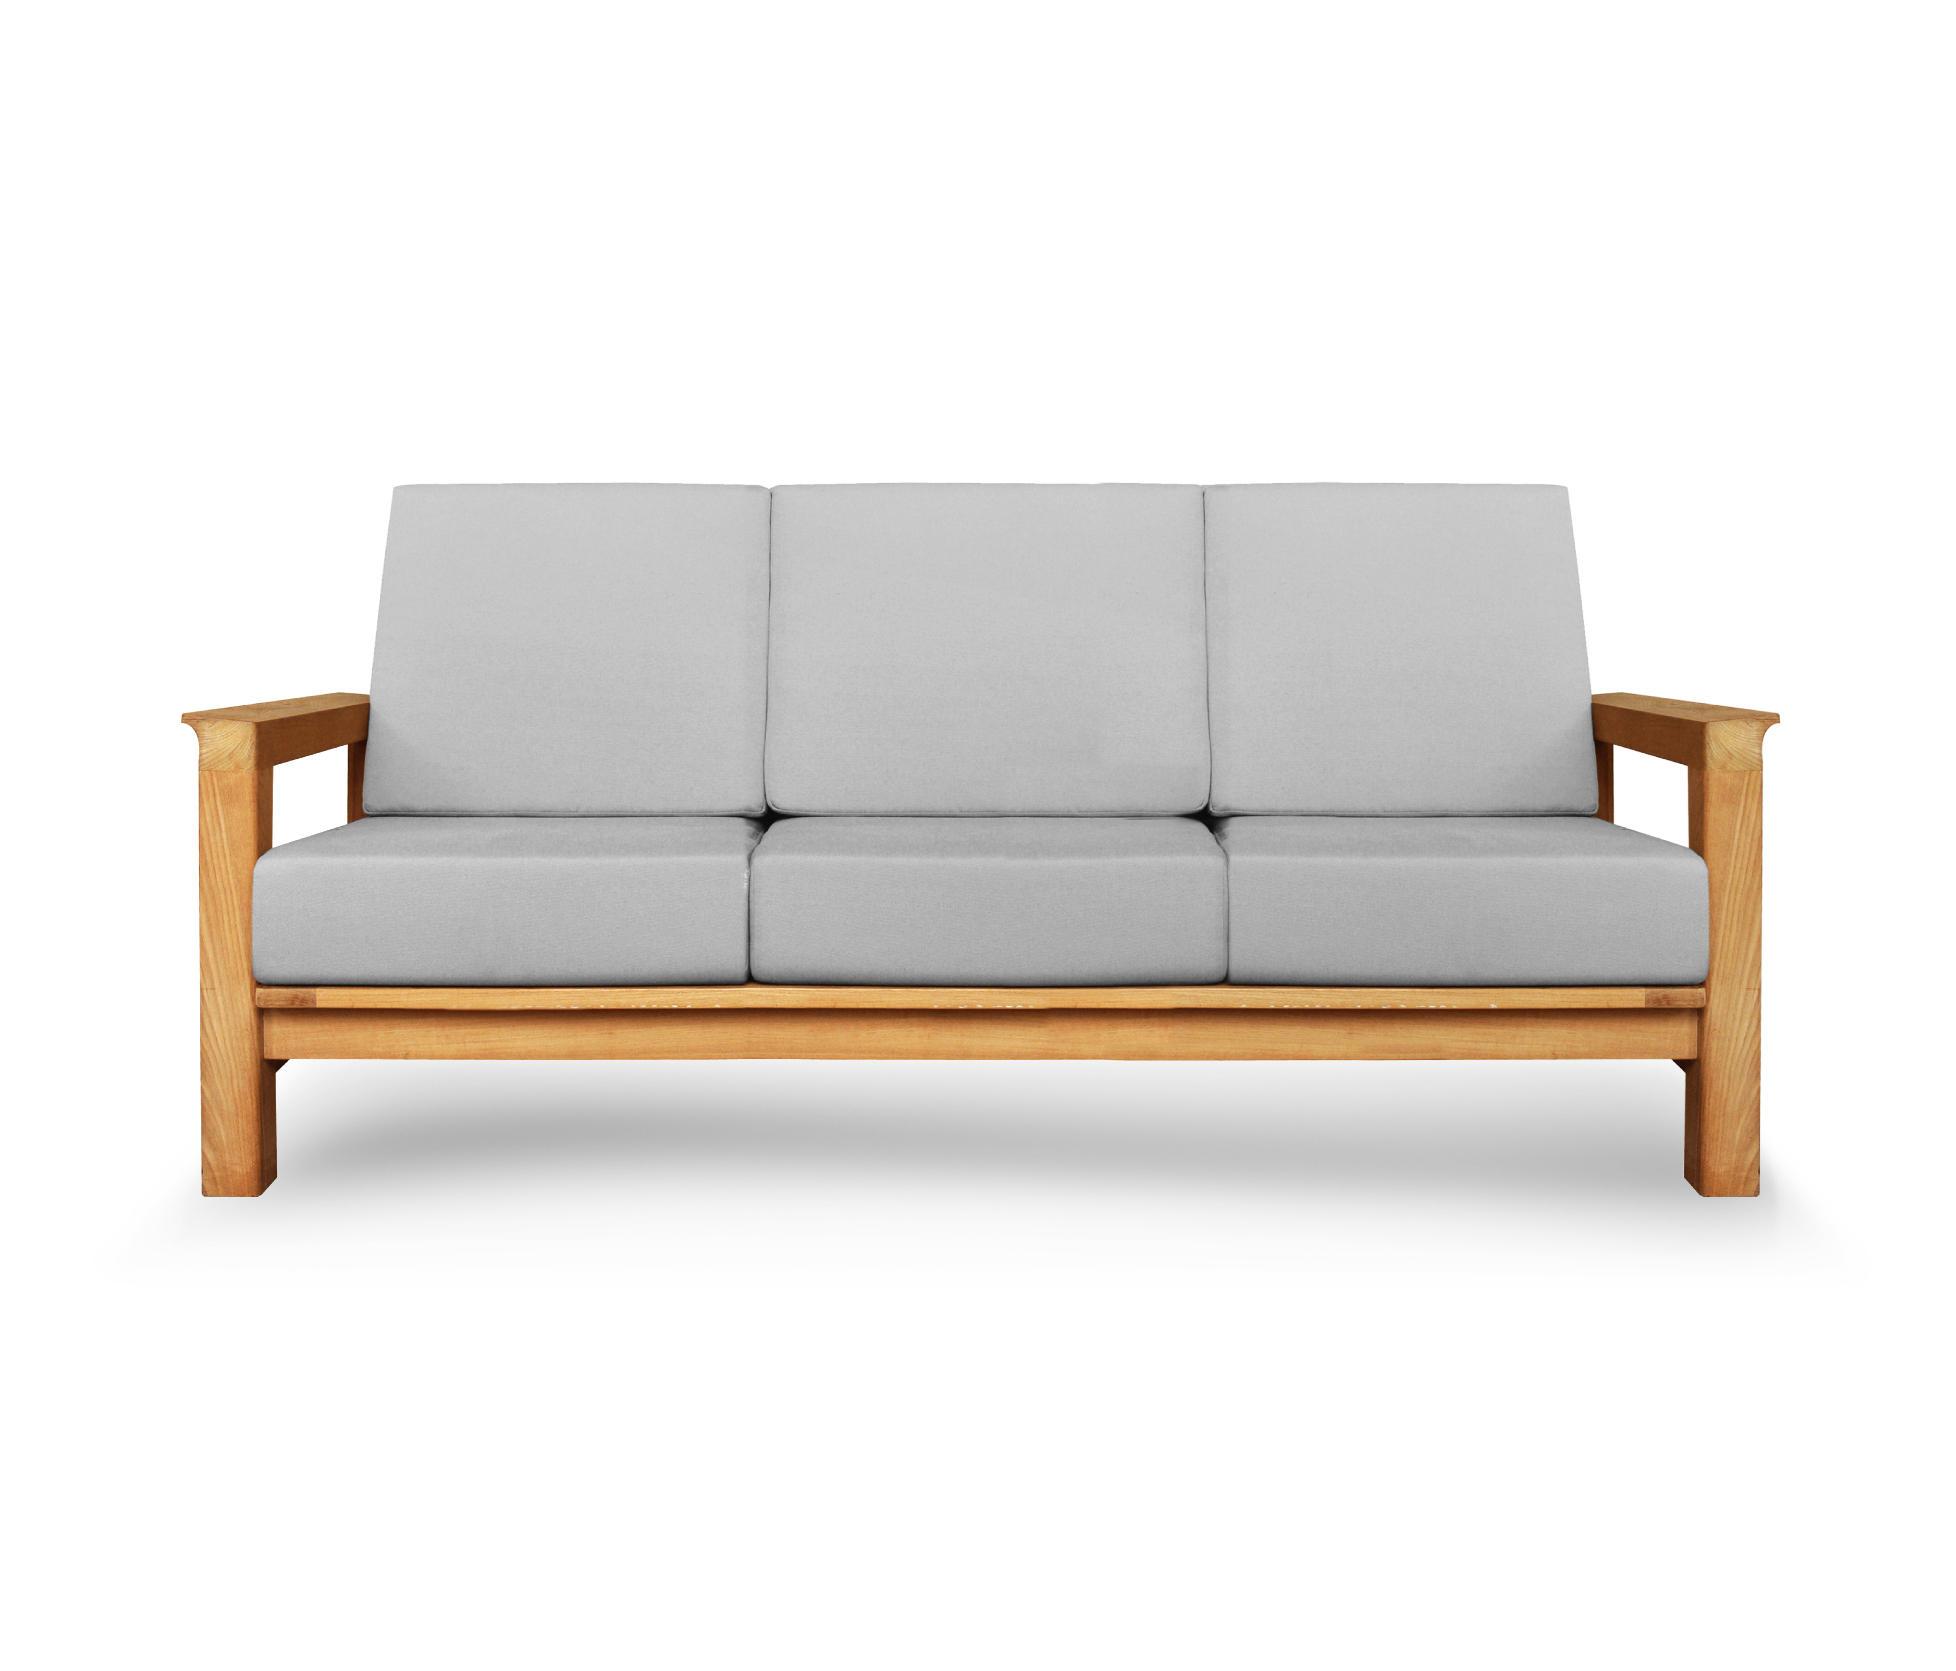 Sofas Frankfurt frankfurt 3 seater garden sofas from deesawat architonic